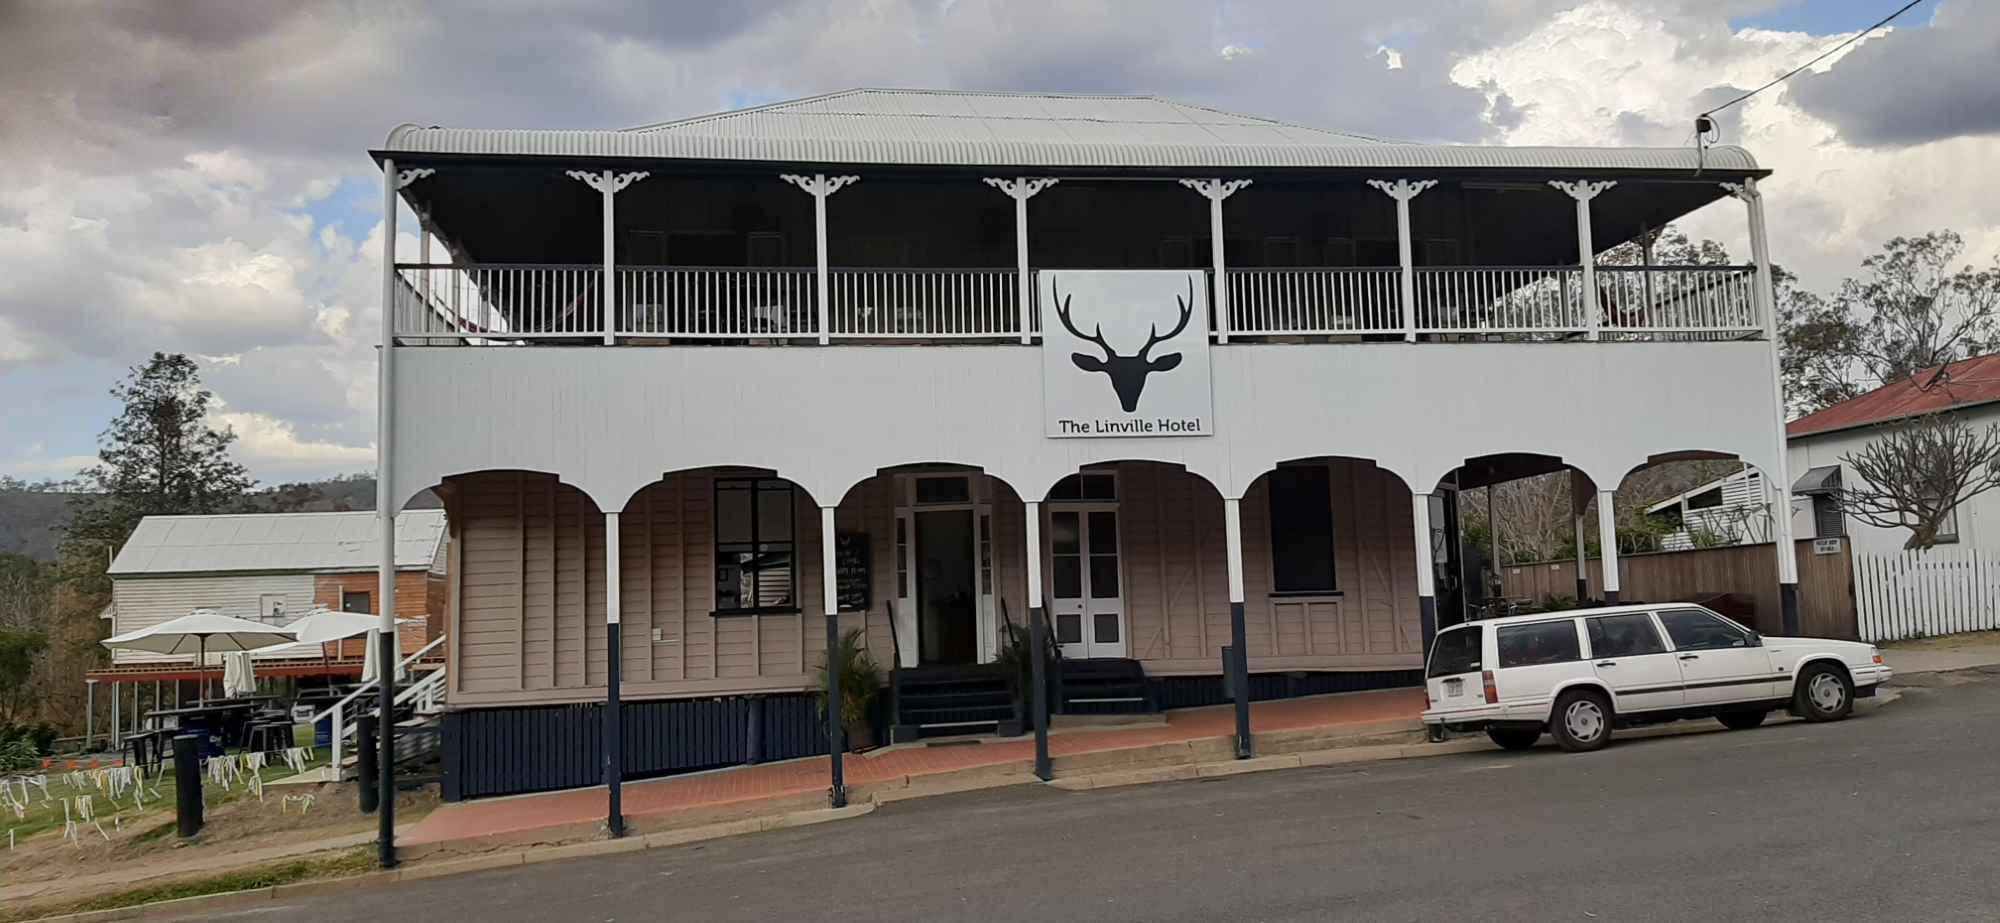 Linville Hotel BVRT